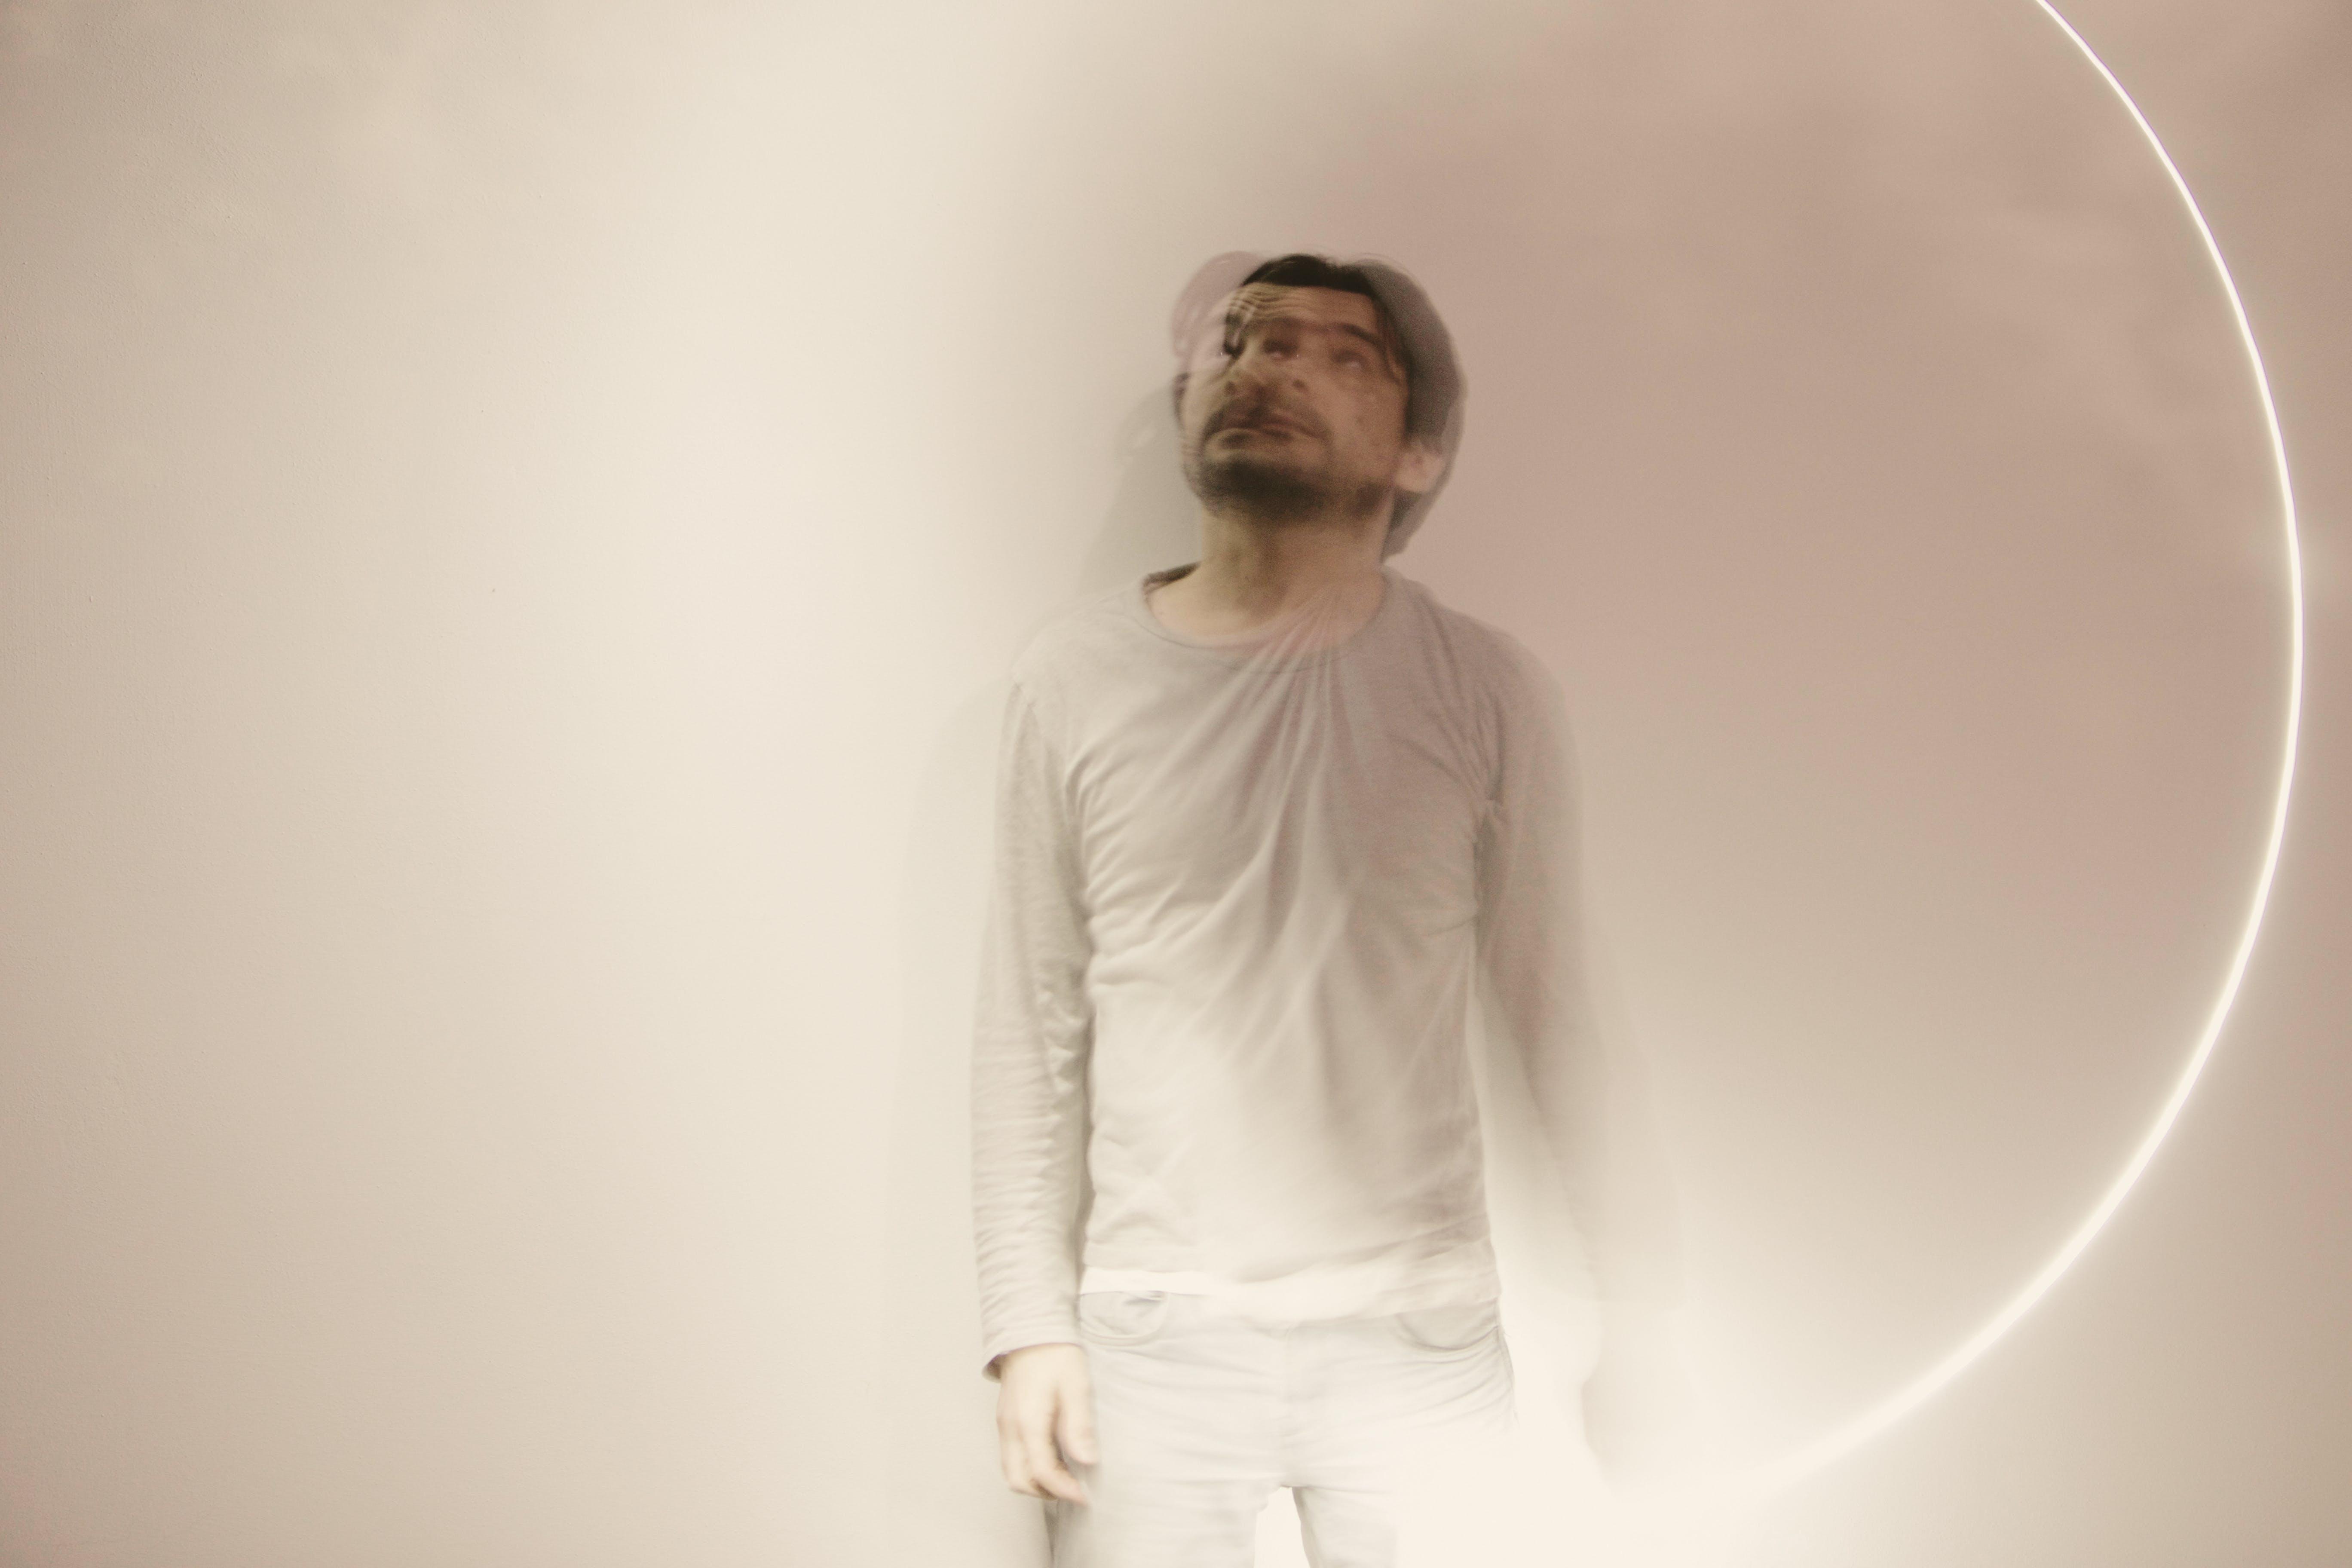 alessandro simonetto, guy, light reflections